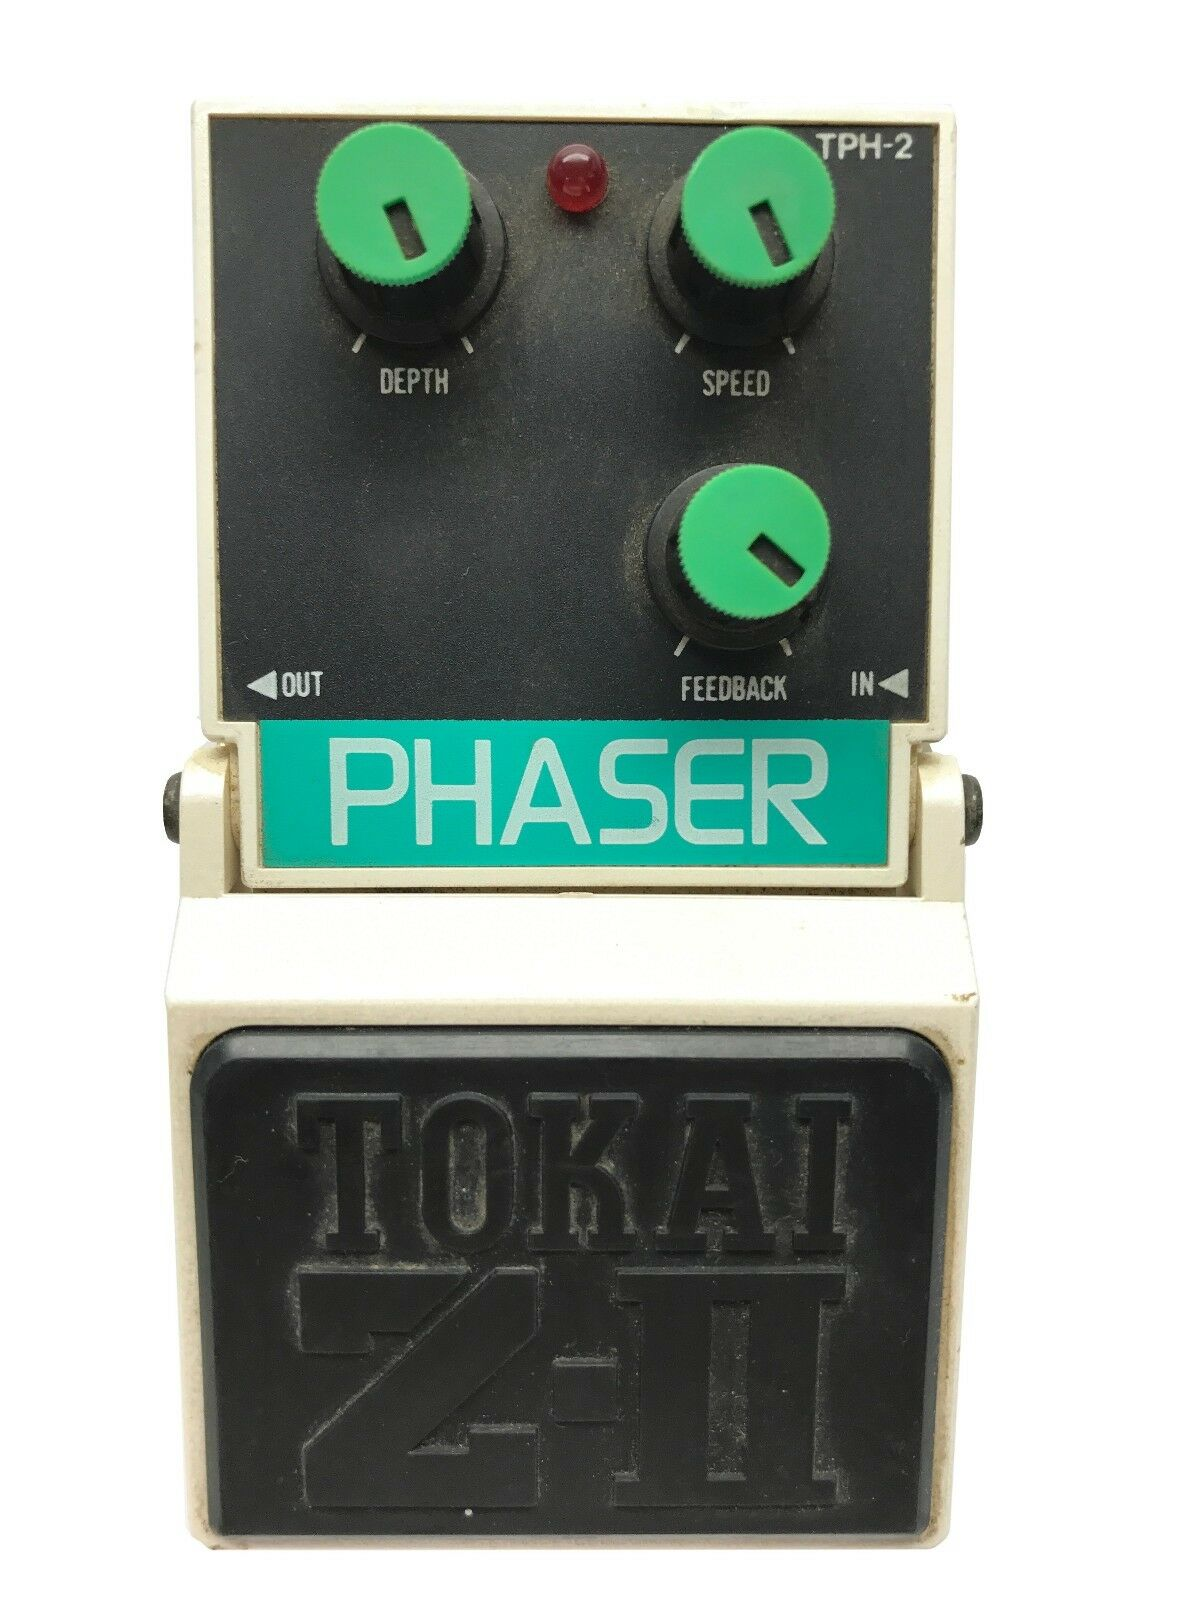 Tokai TPH-2, Phaser, Z-II Super Effect s, MIJ, 1980s, Vintage Effect